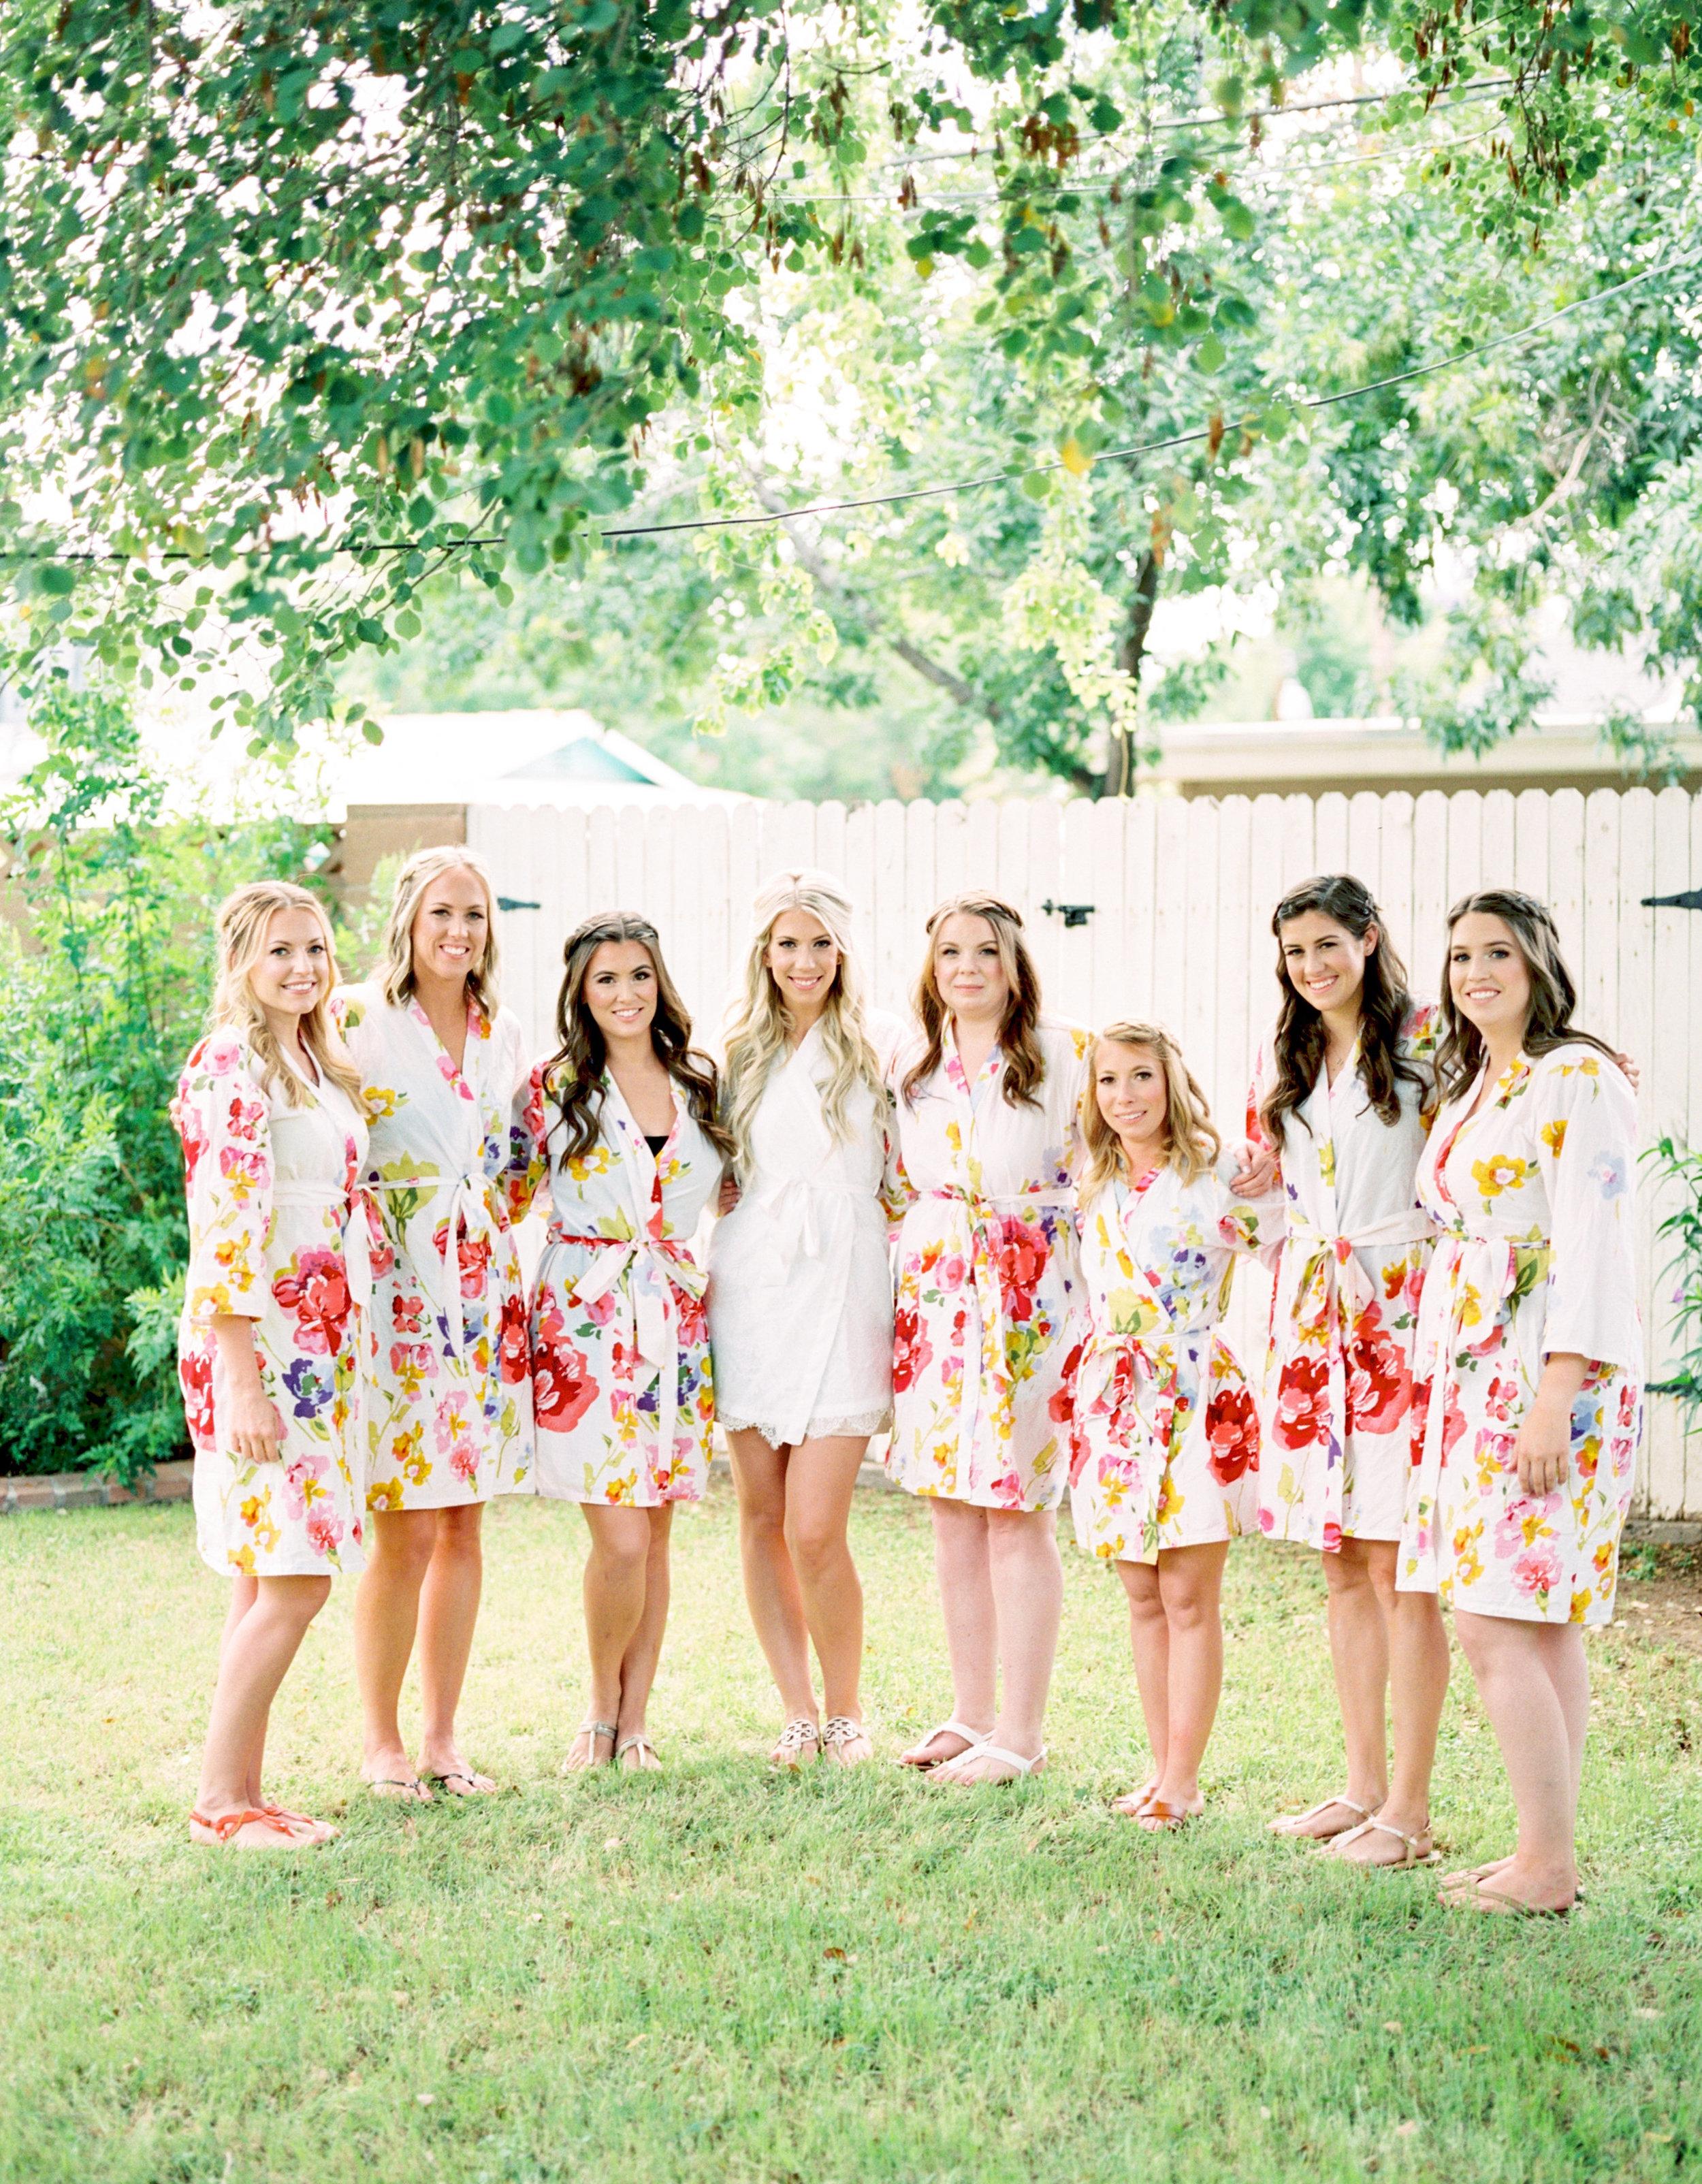 Bridal party photos, floral bath robes, bridesmaids bath robes